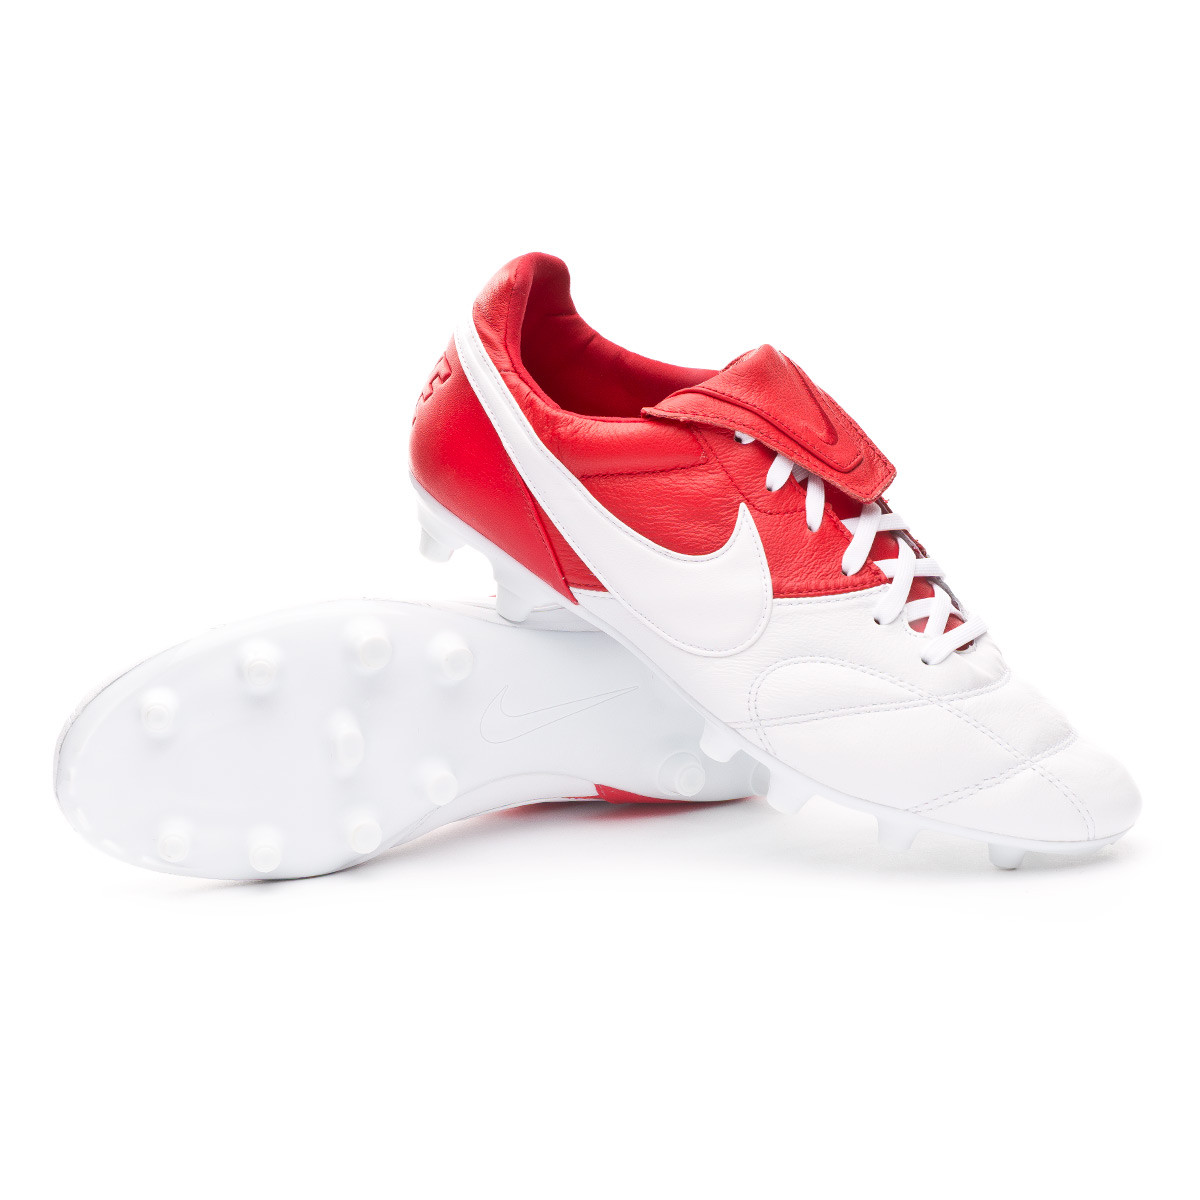 Football Boots Nike Tiempo Premier II